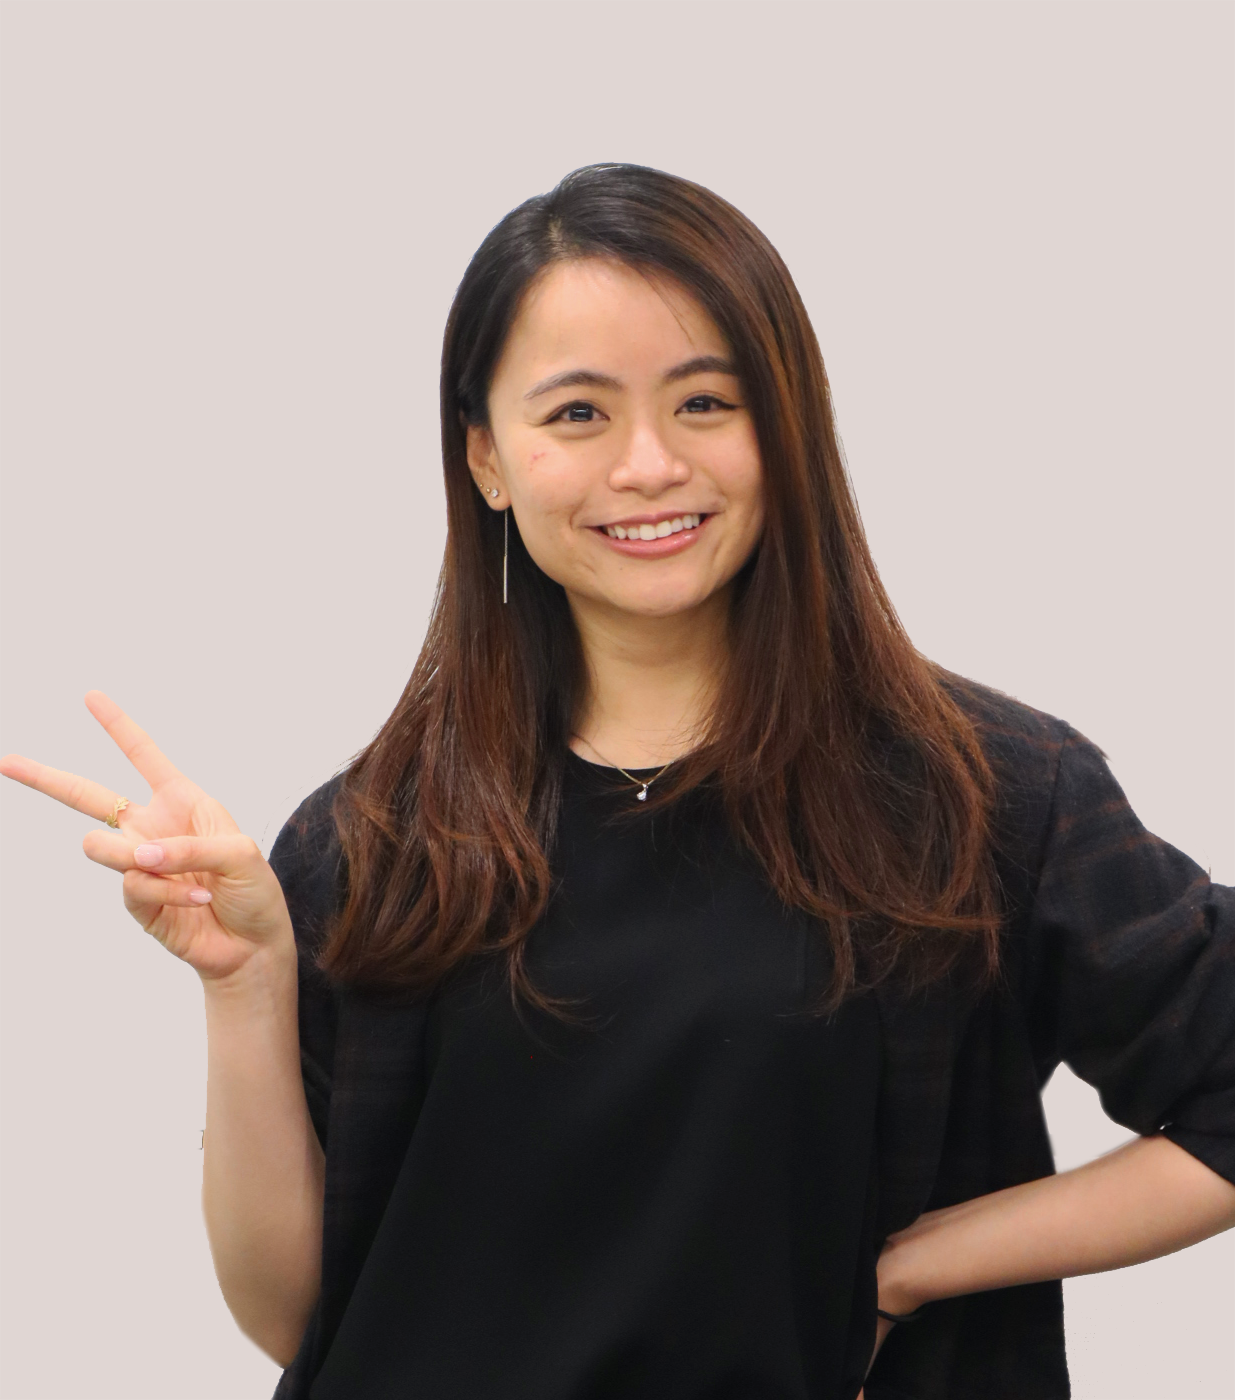 Funny portrait photo of Agnes Kan, Service Designer at MAKE Studios Hong Kong.